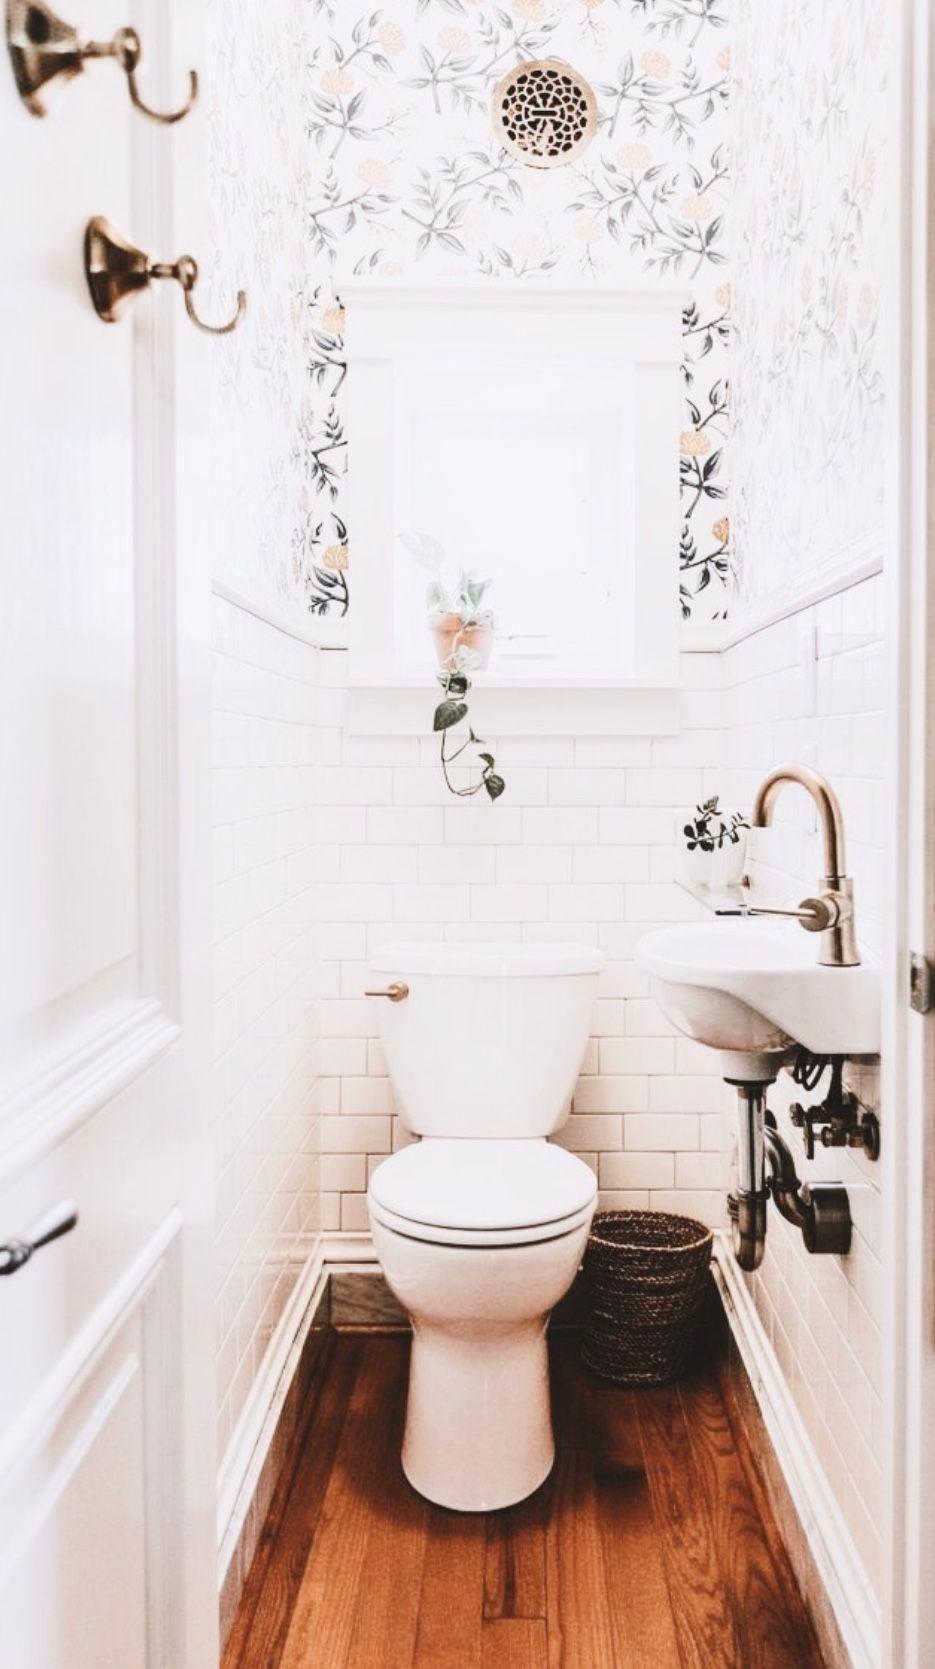 Pin by evania osborn on bathe me in pinterest bathroom